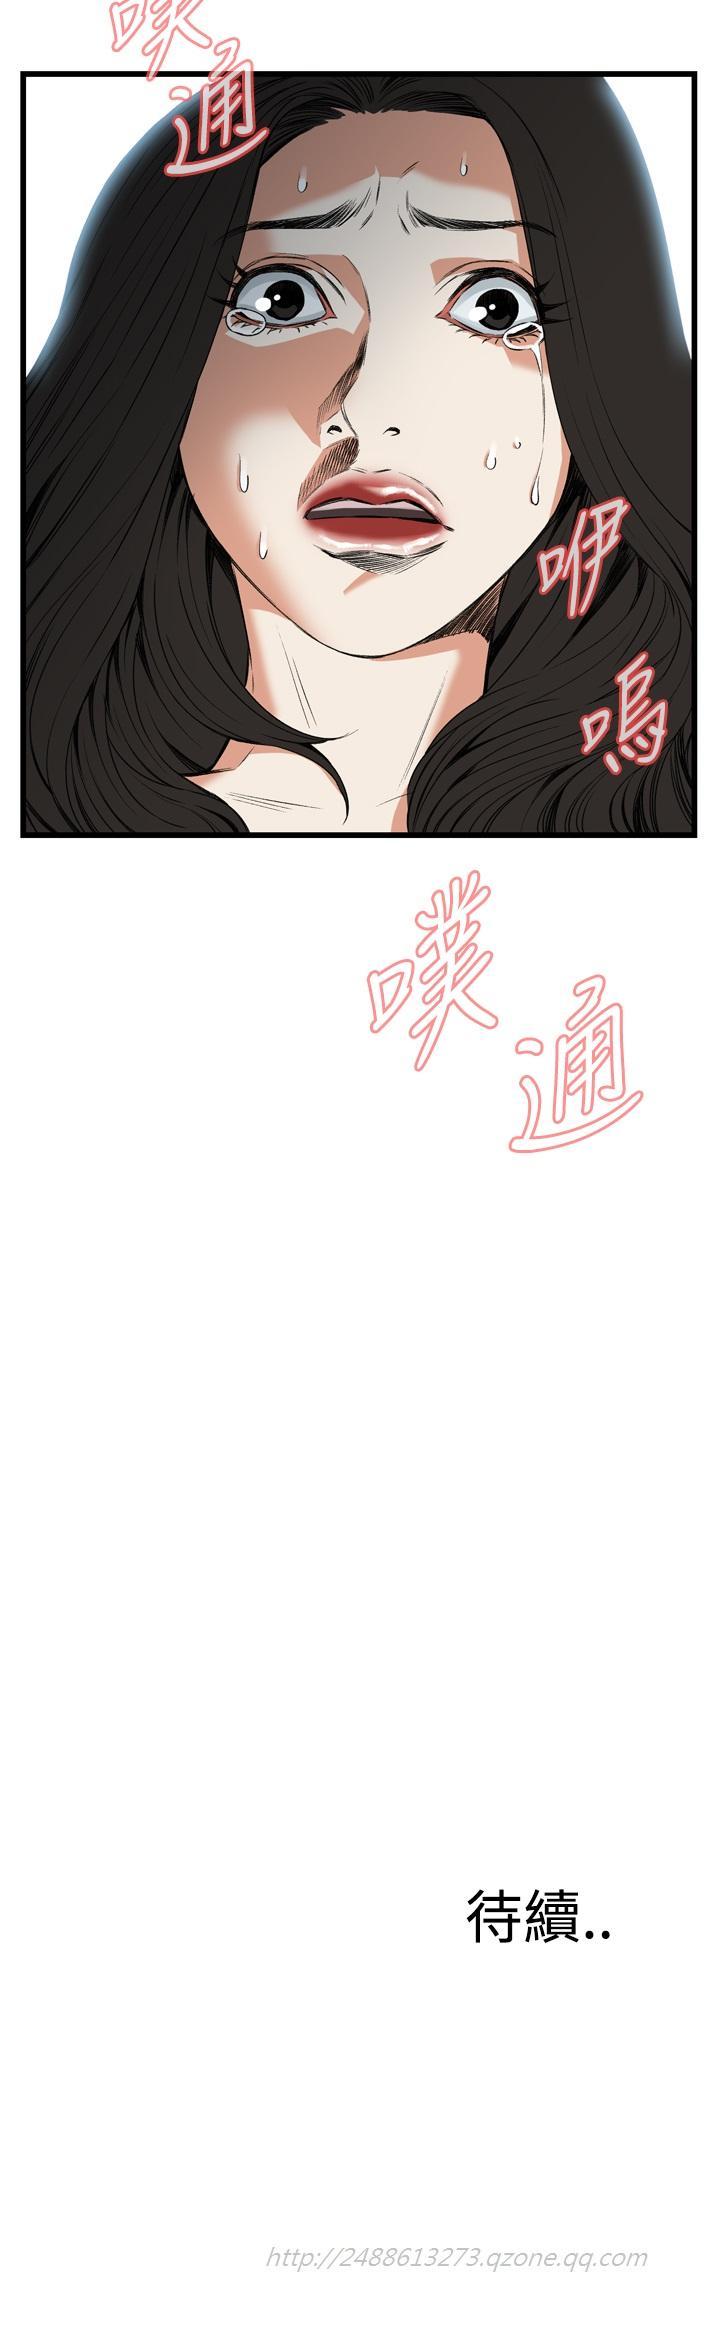 Take a Peek 偷窥 Ch.39~55 [Chinese]中文 310